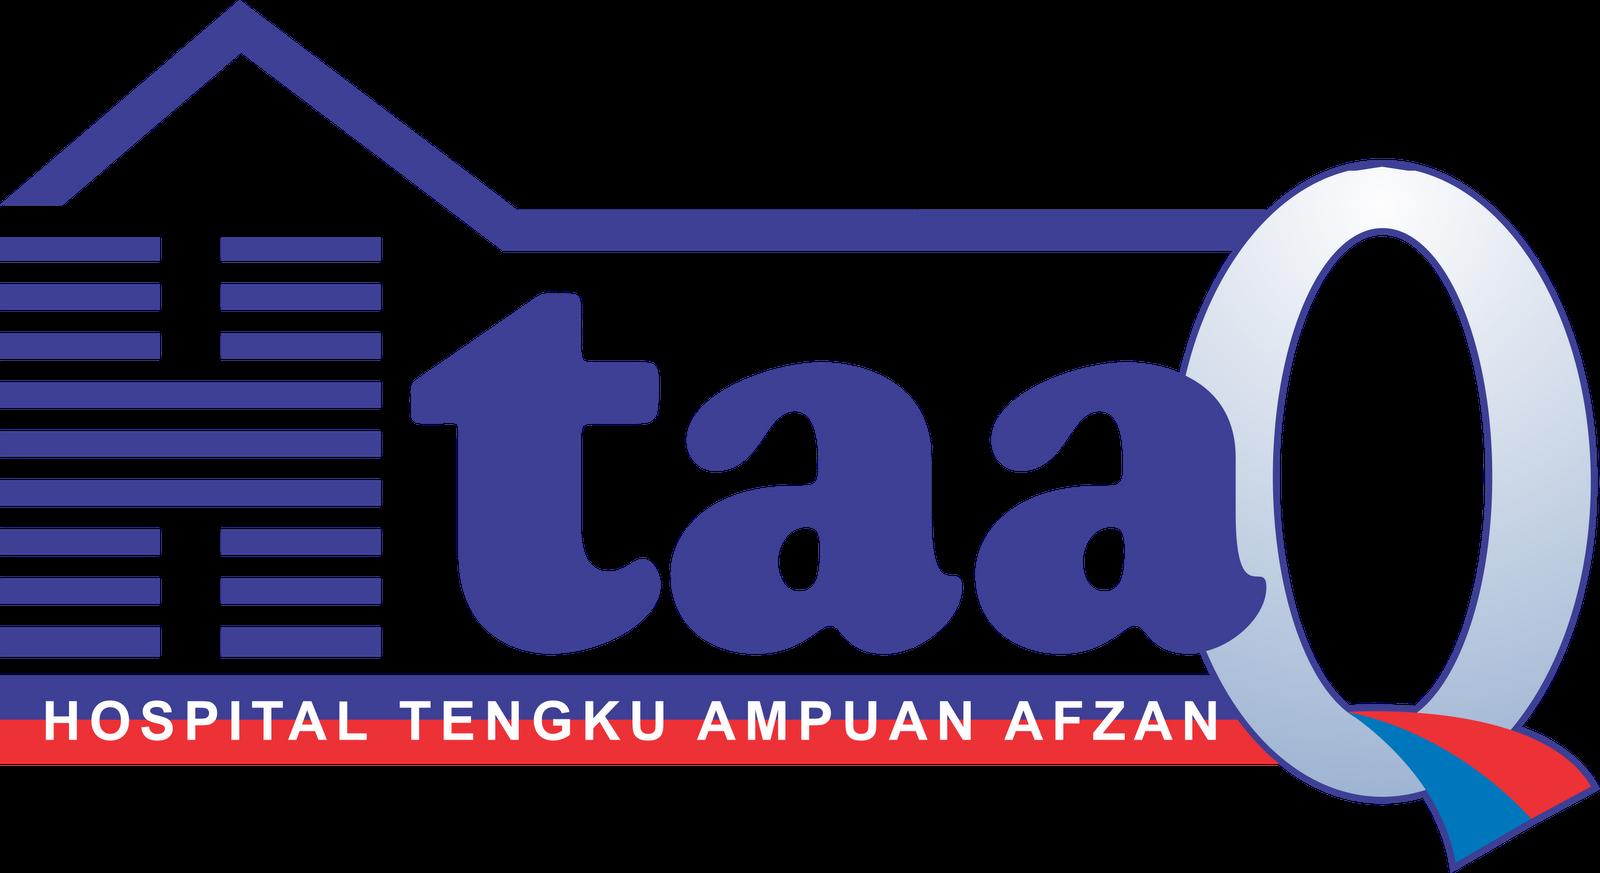 Hospital Tengku Ampuan Afzan Htaa